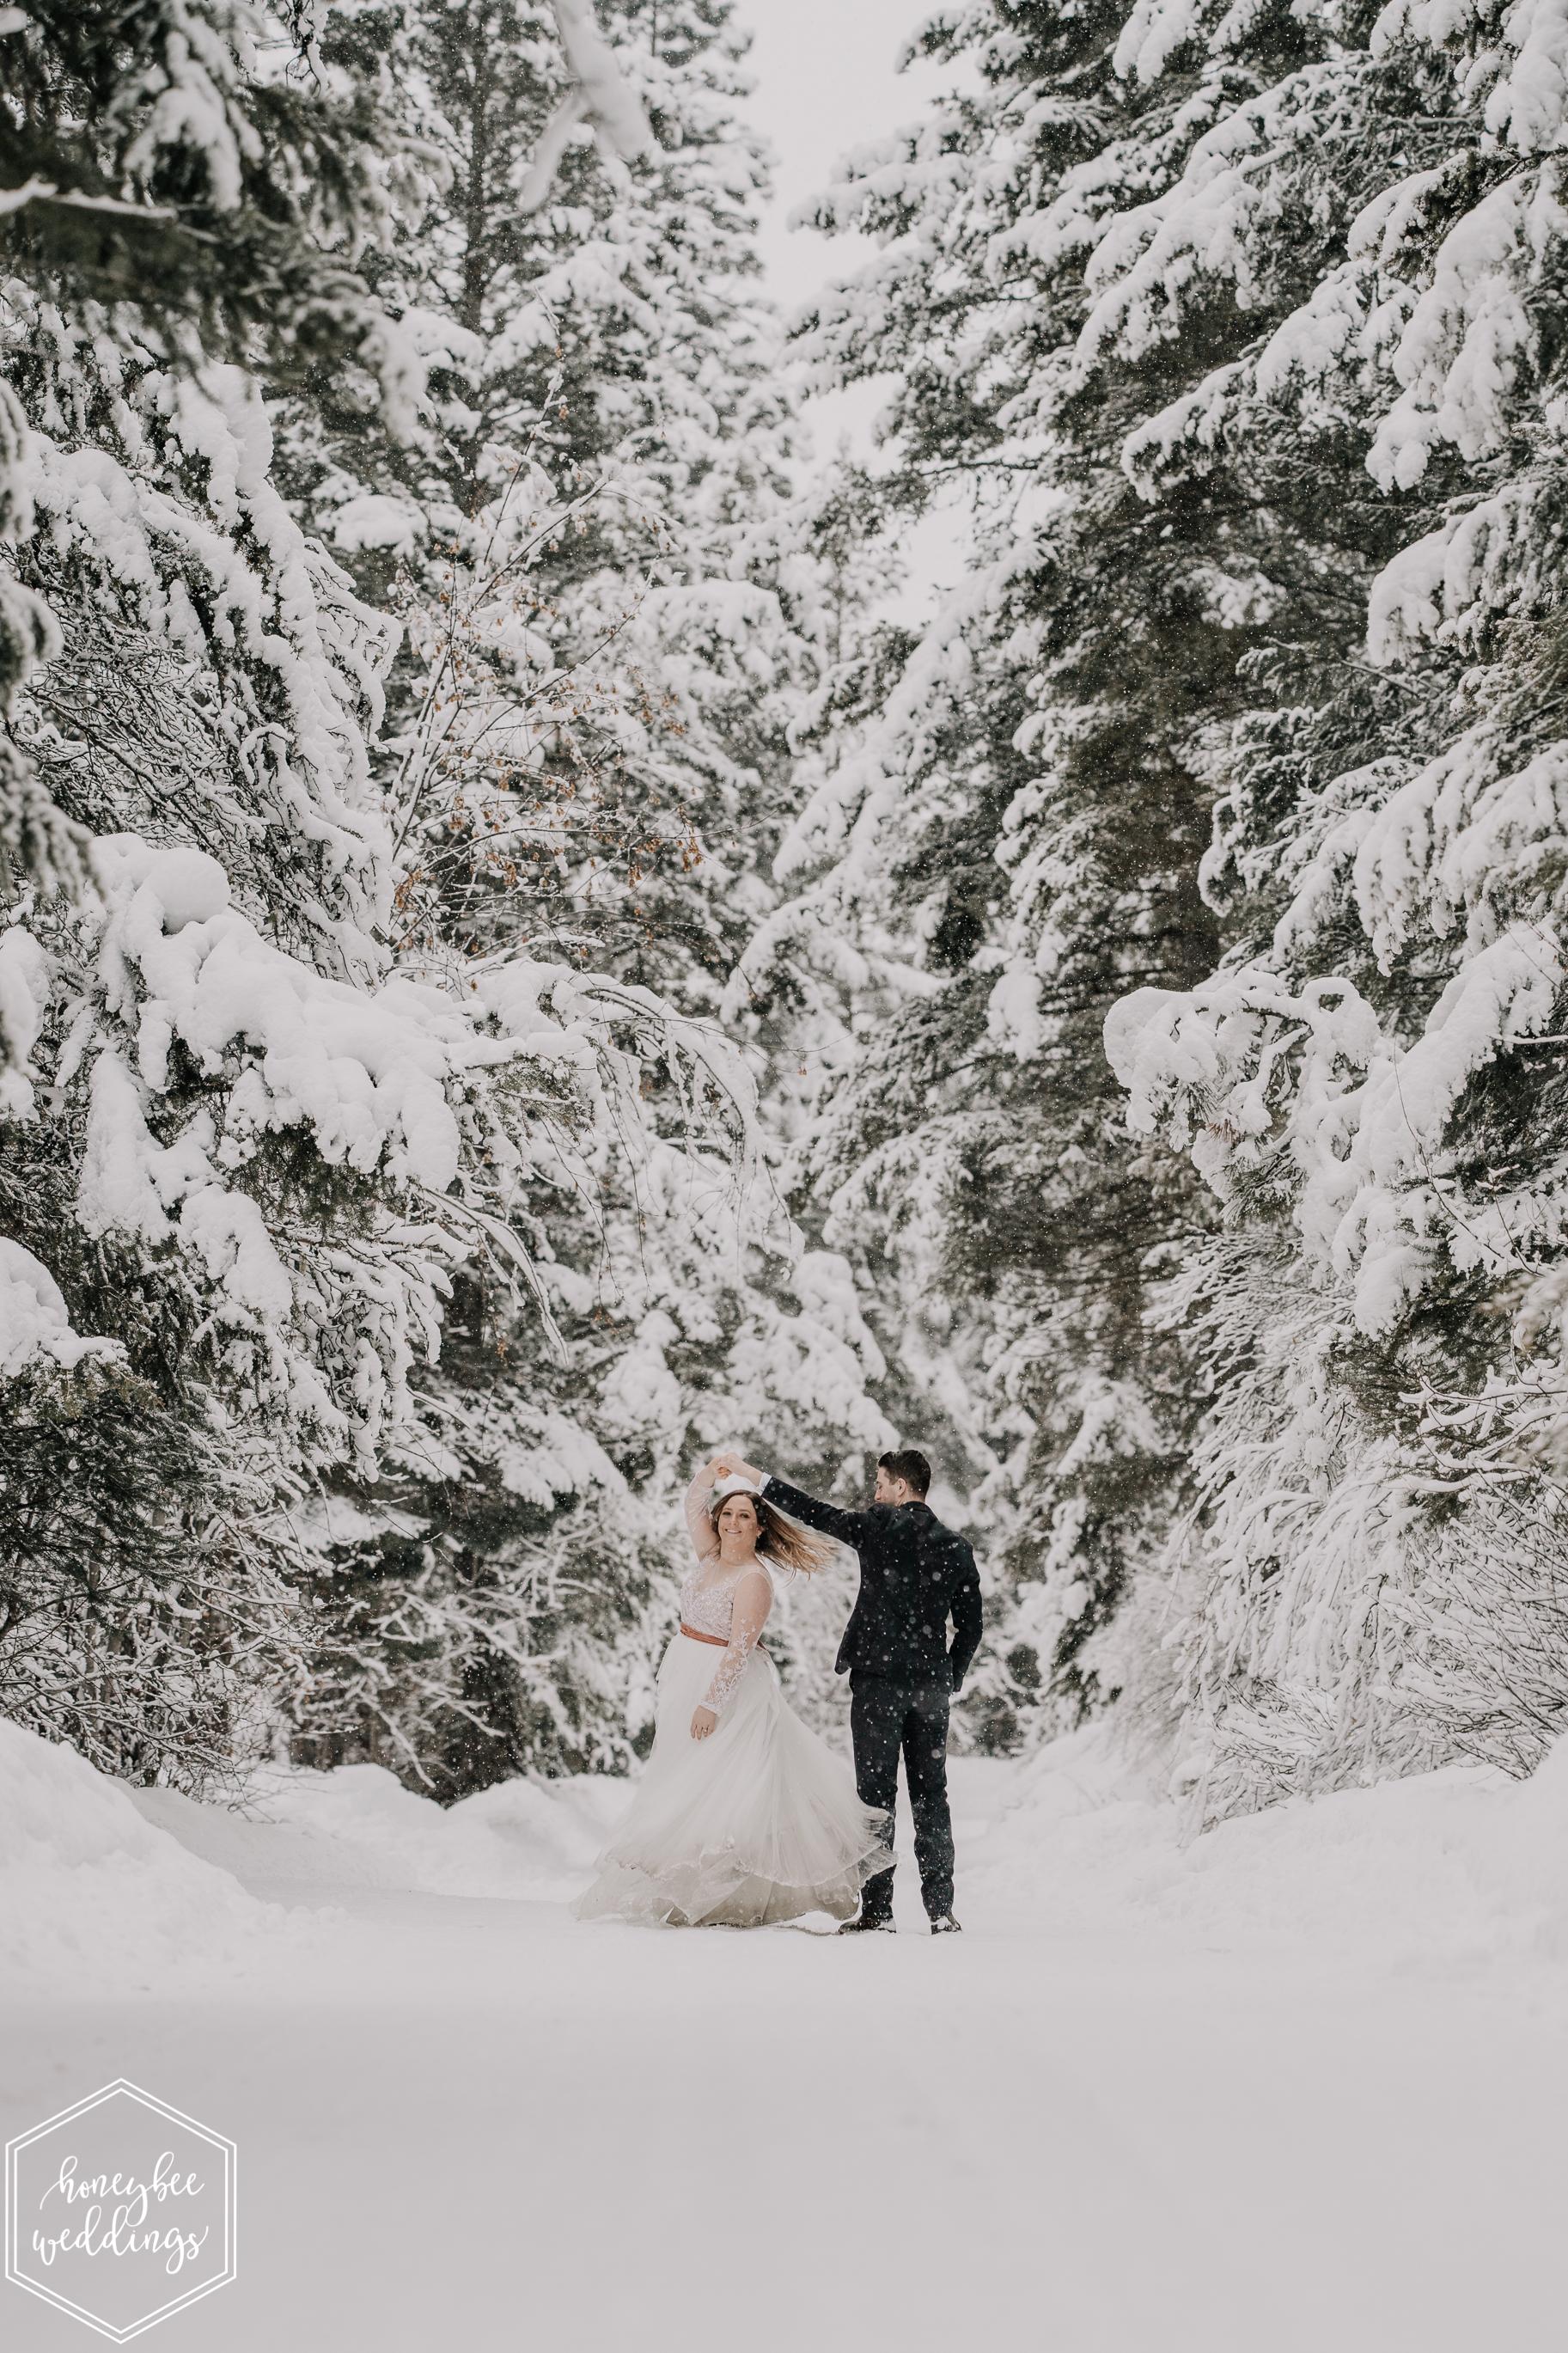 0386Montana Wedding Photographer_Missoula Winter Wedding_Wedding at Fort Missoula_Meri & Carter_January 21, 2019-168.jpg